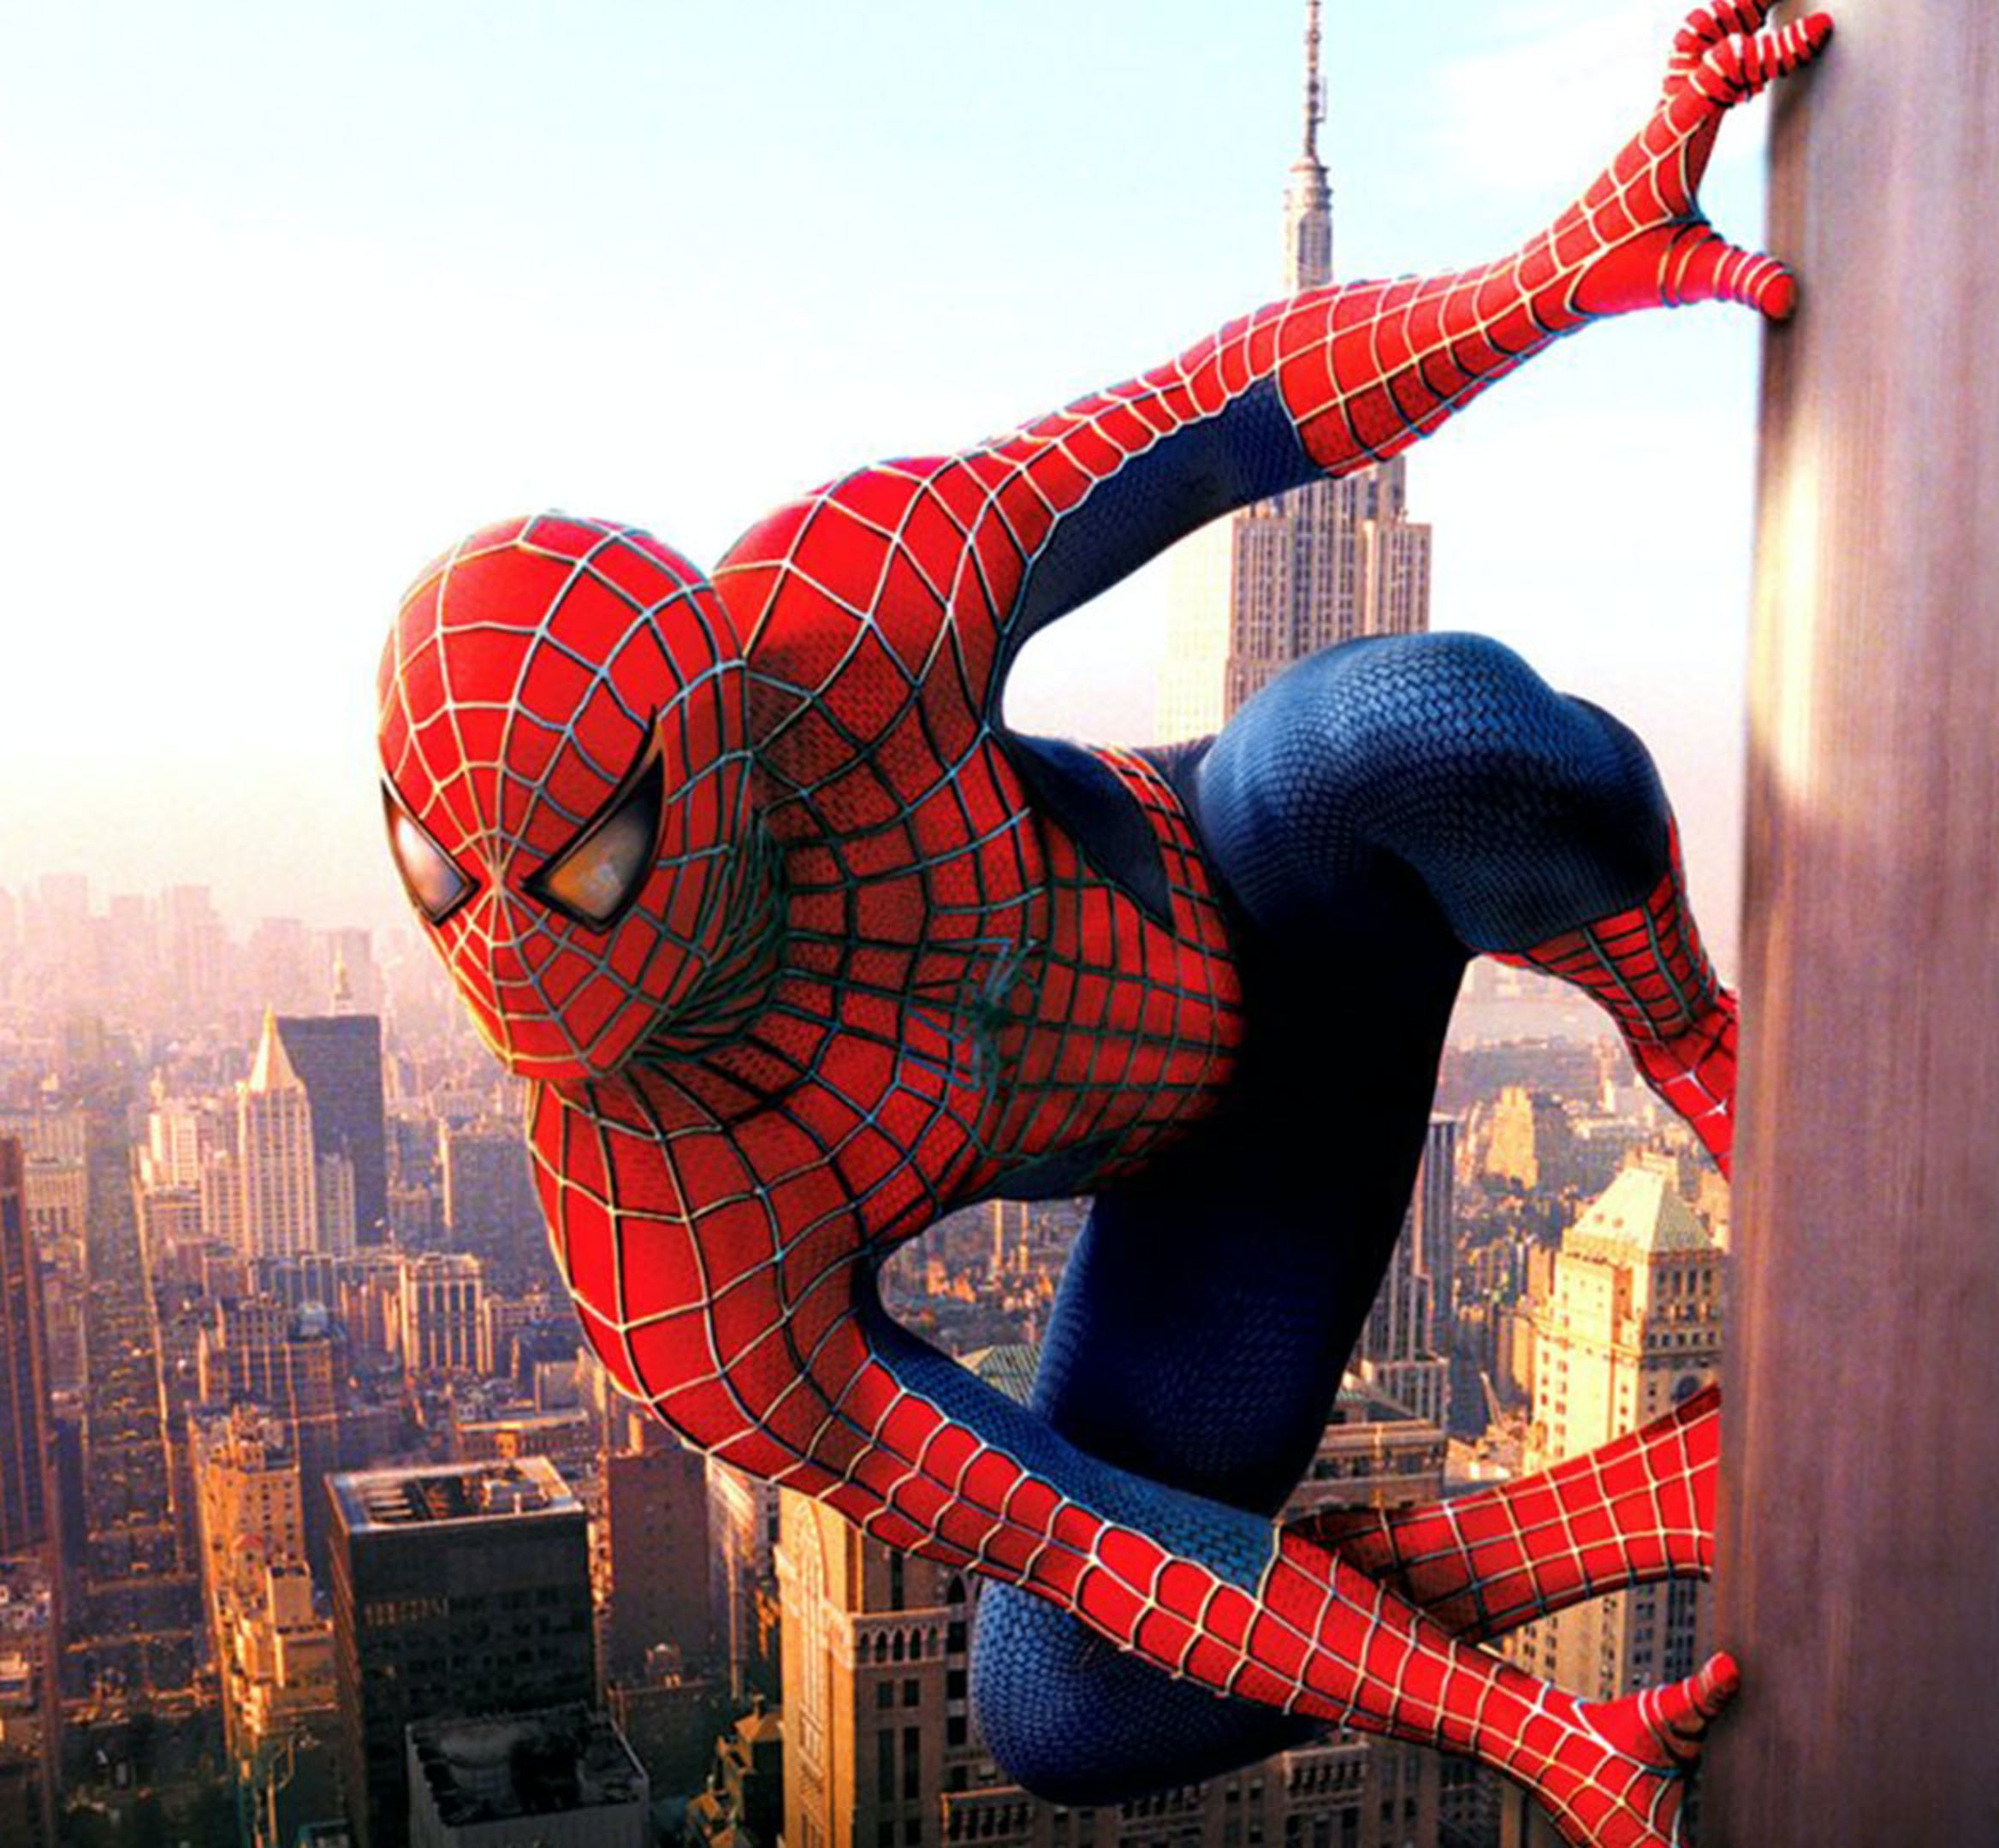 spiderman hero